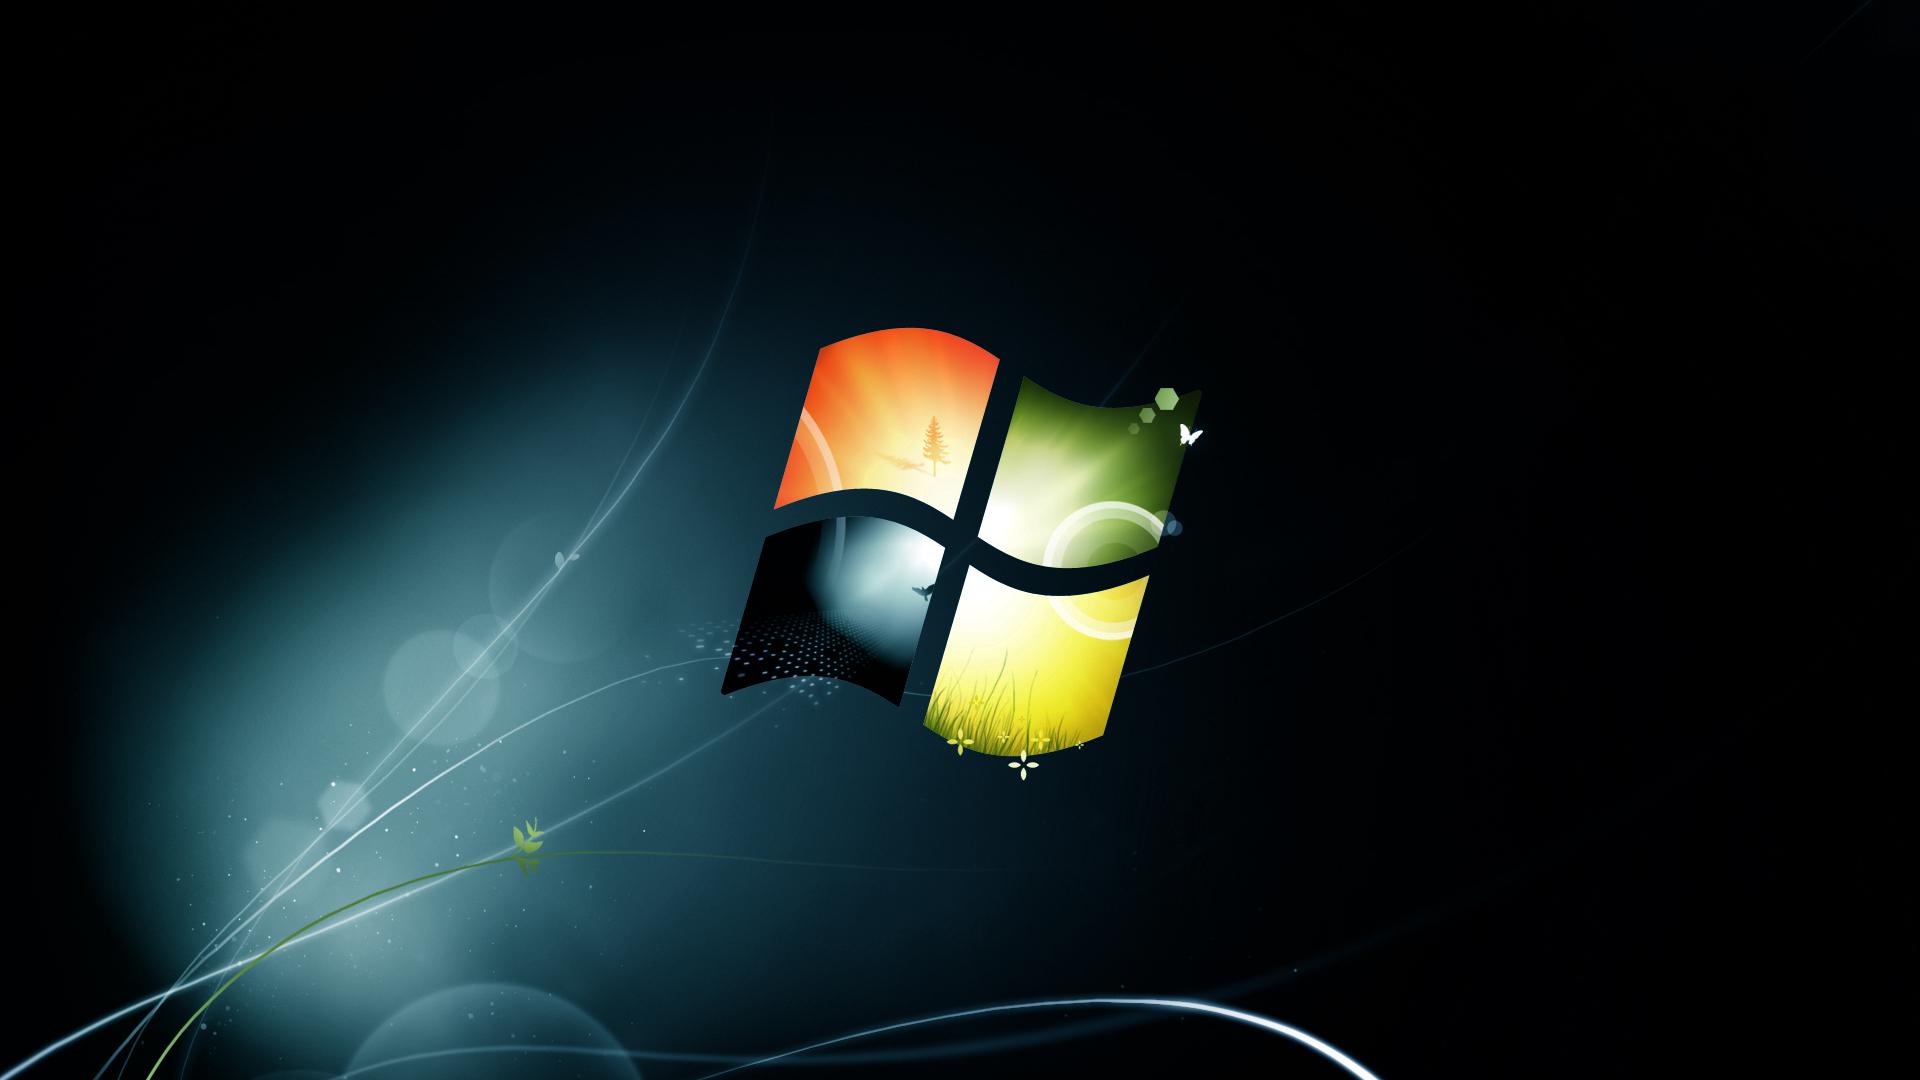 Free Download File Name Windows 7 Black Wallpaper Posted Piph